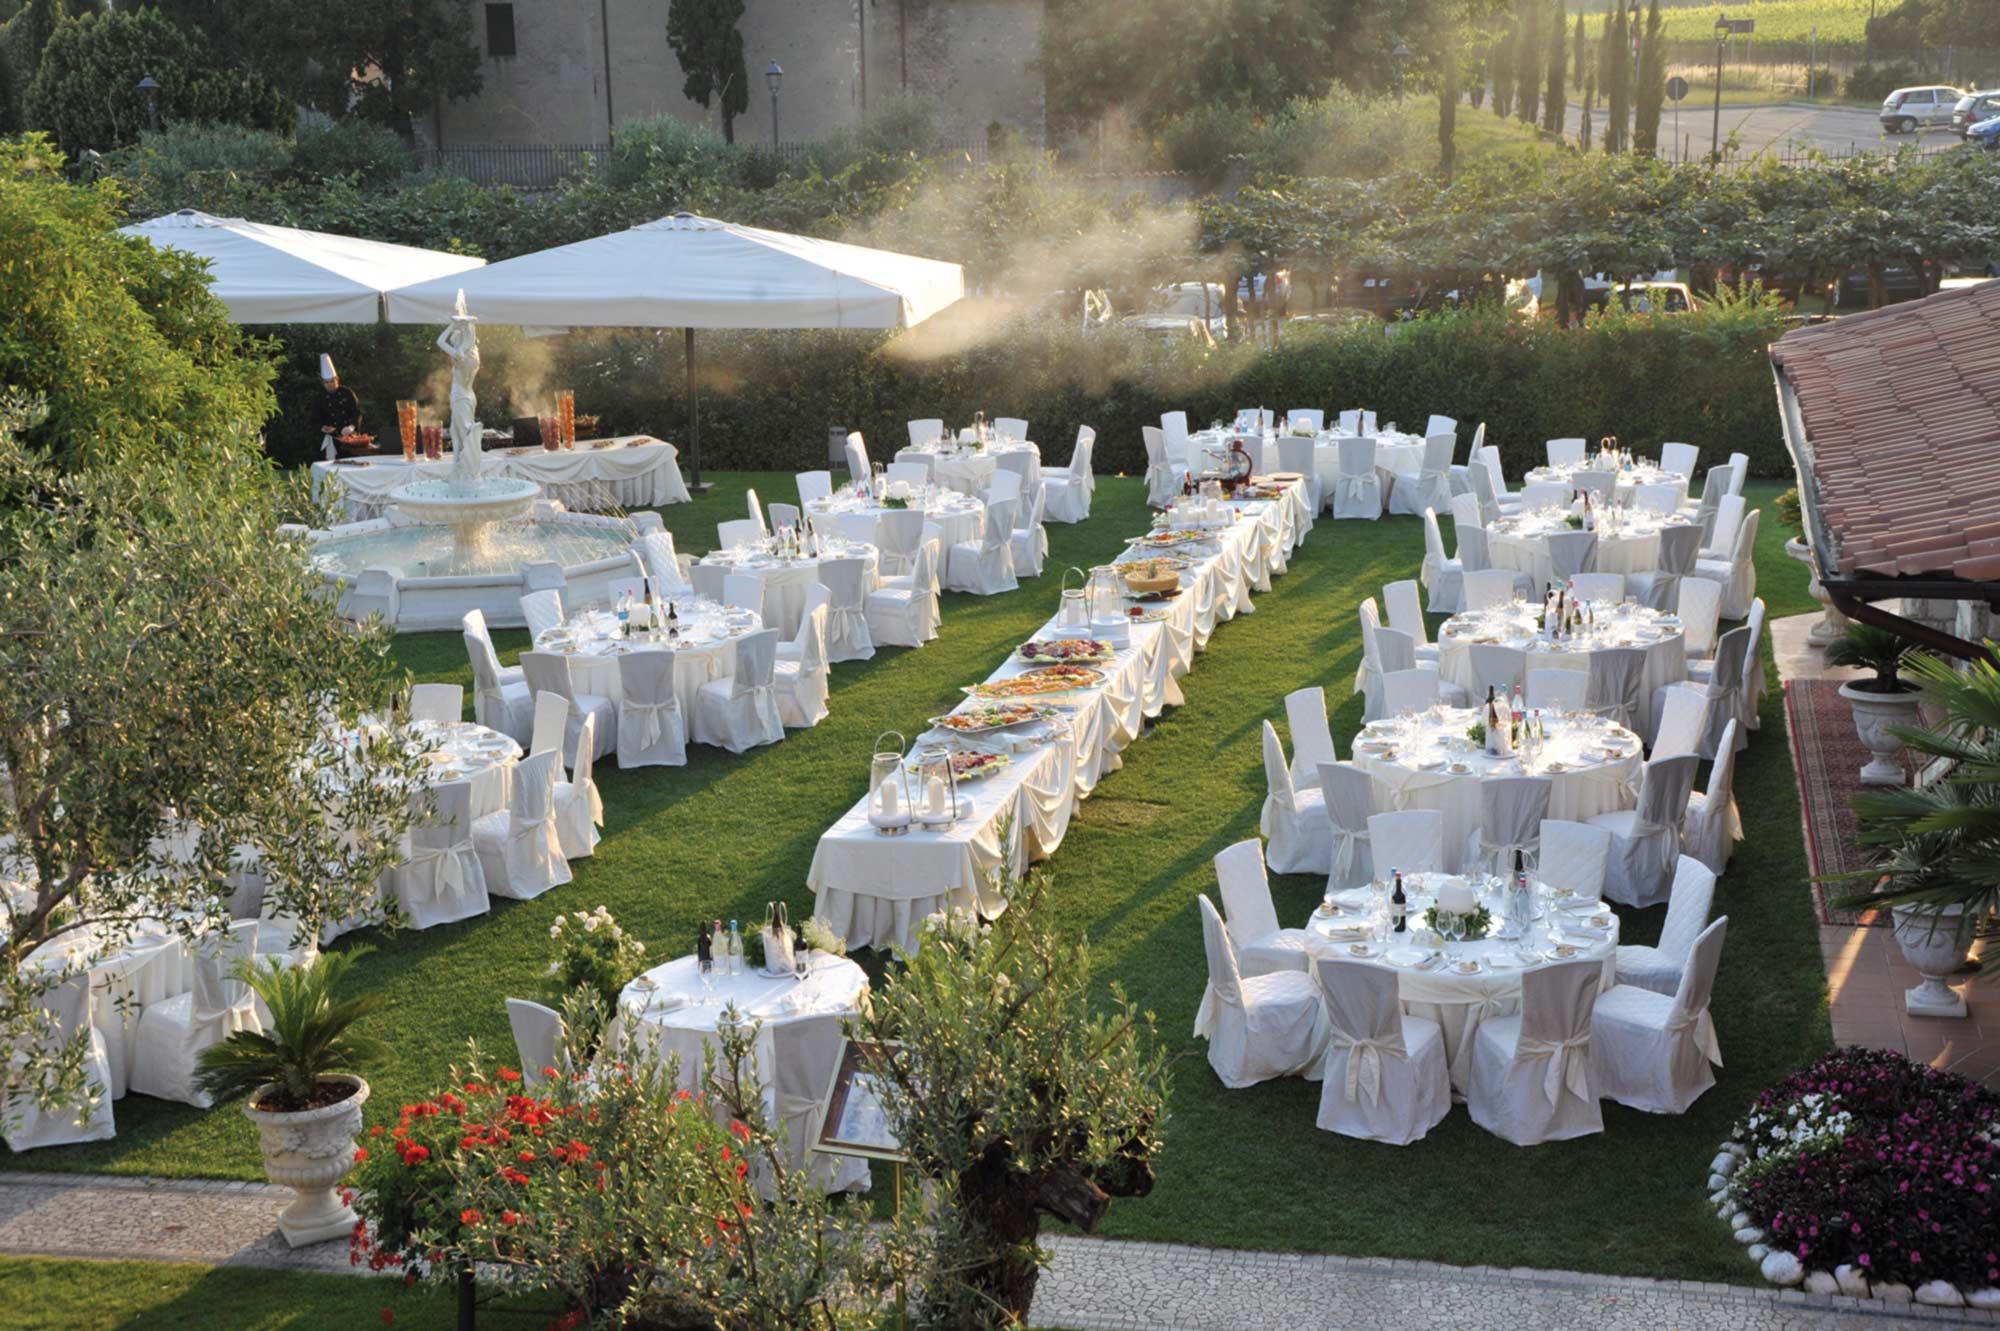 Matrimonio In Ristorante : Matrimonio ristorante giardino